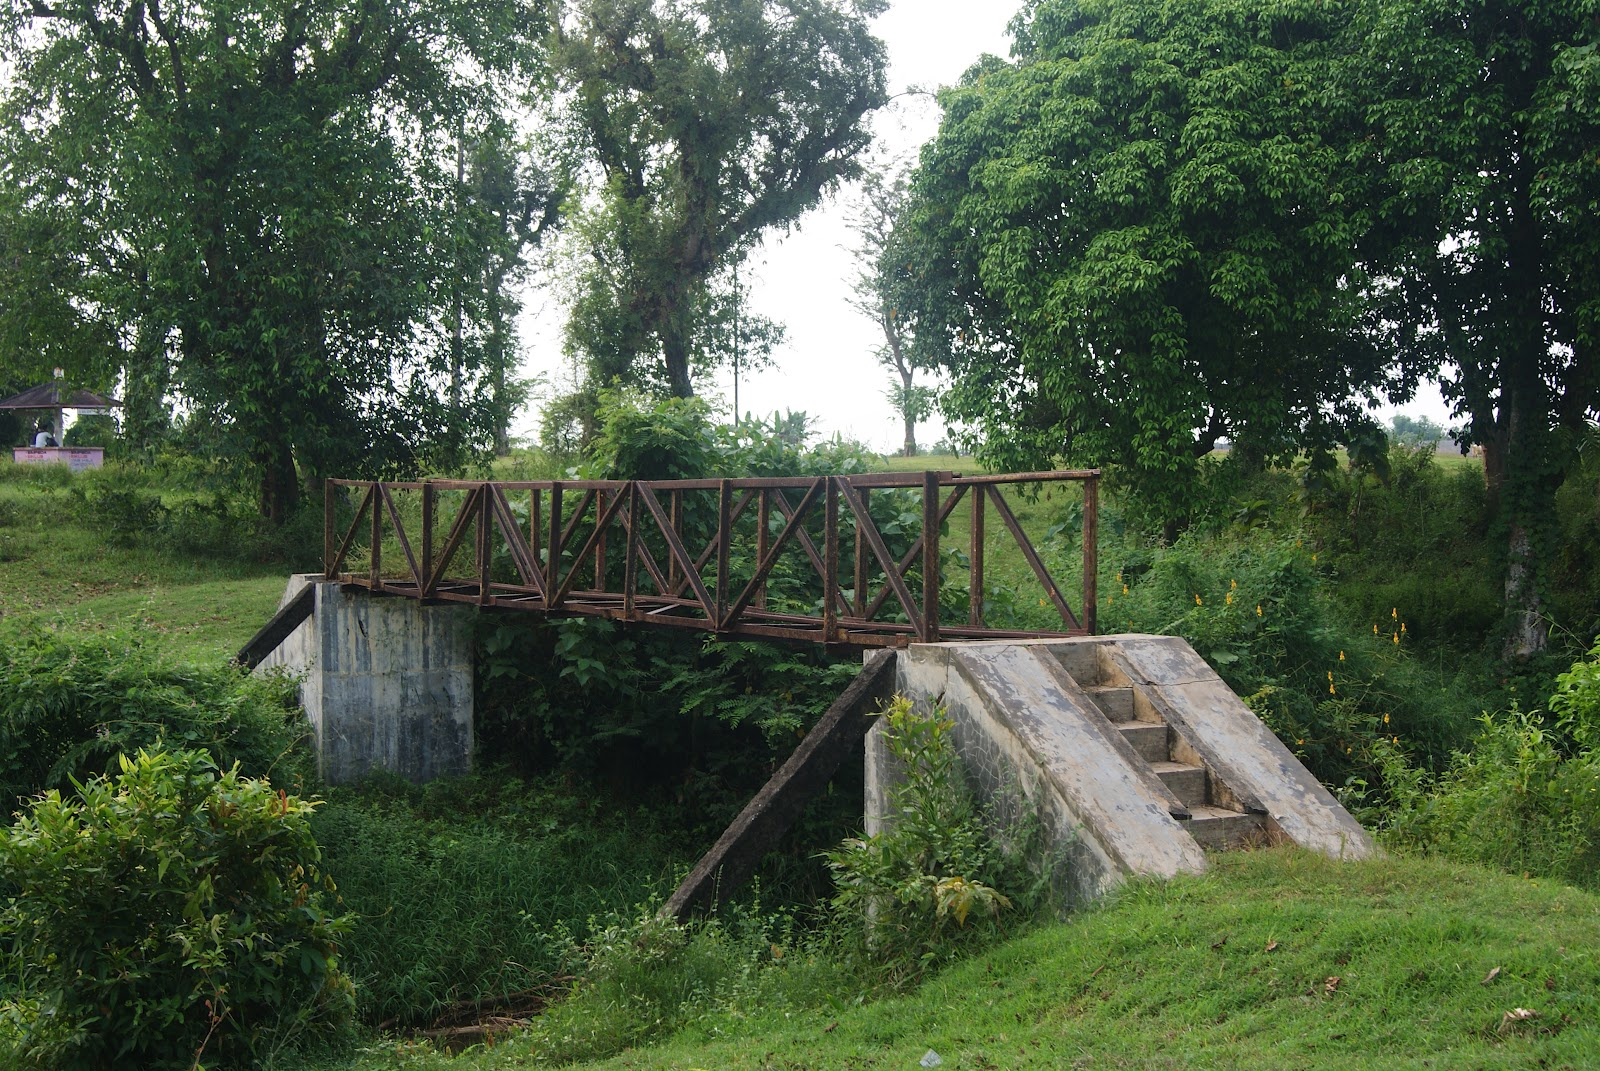 Wana Wisata Dander Perum Perhutani Kab Bojonegoro